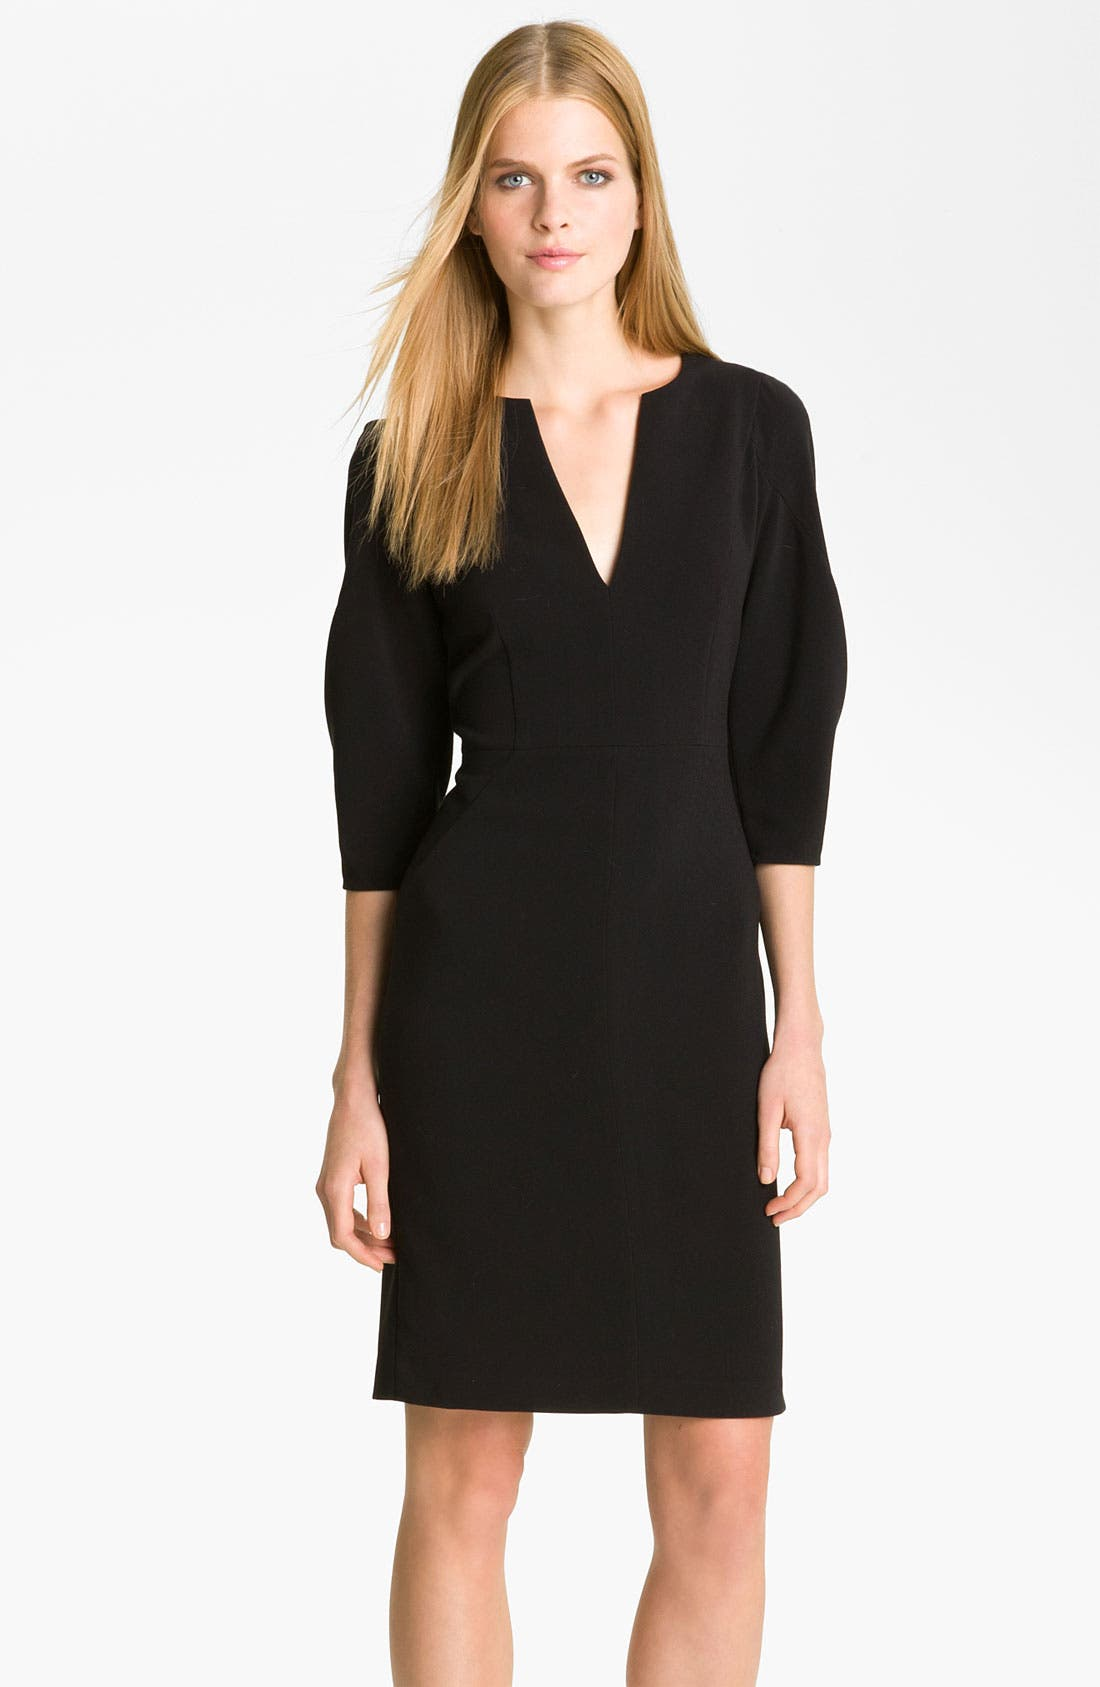 Main Image - Rachel Roy Sheath Dress & Accessories